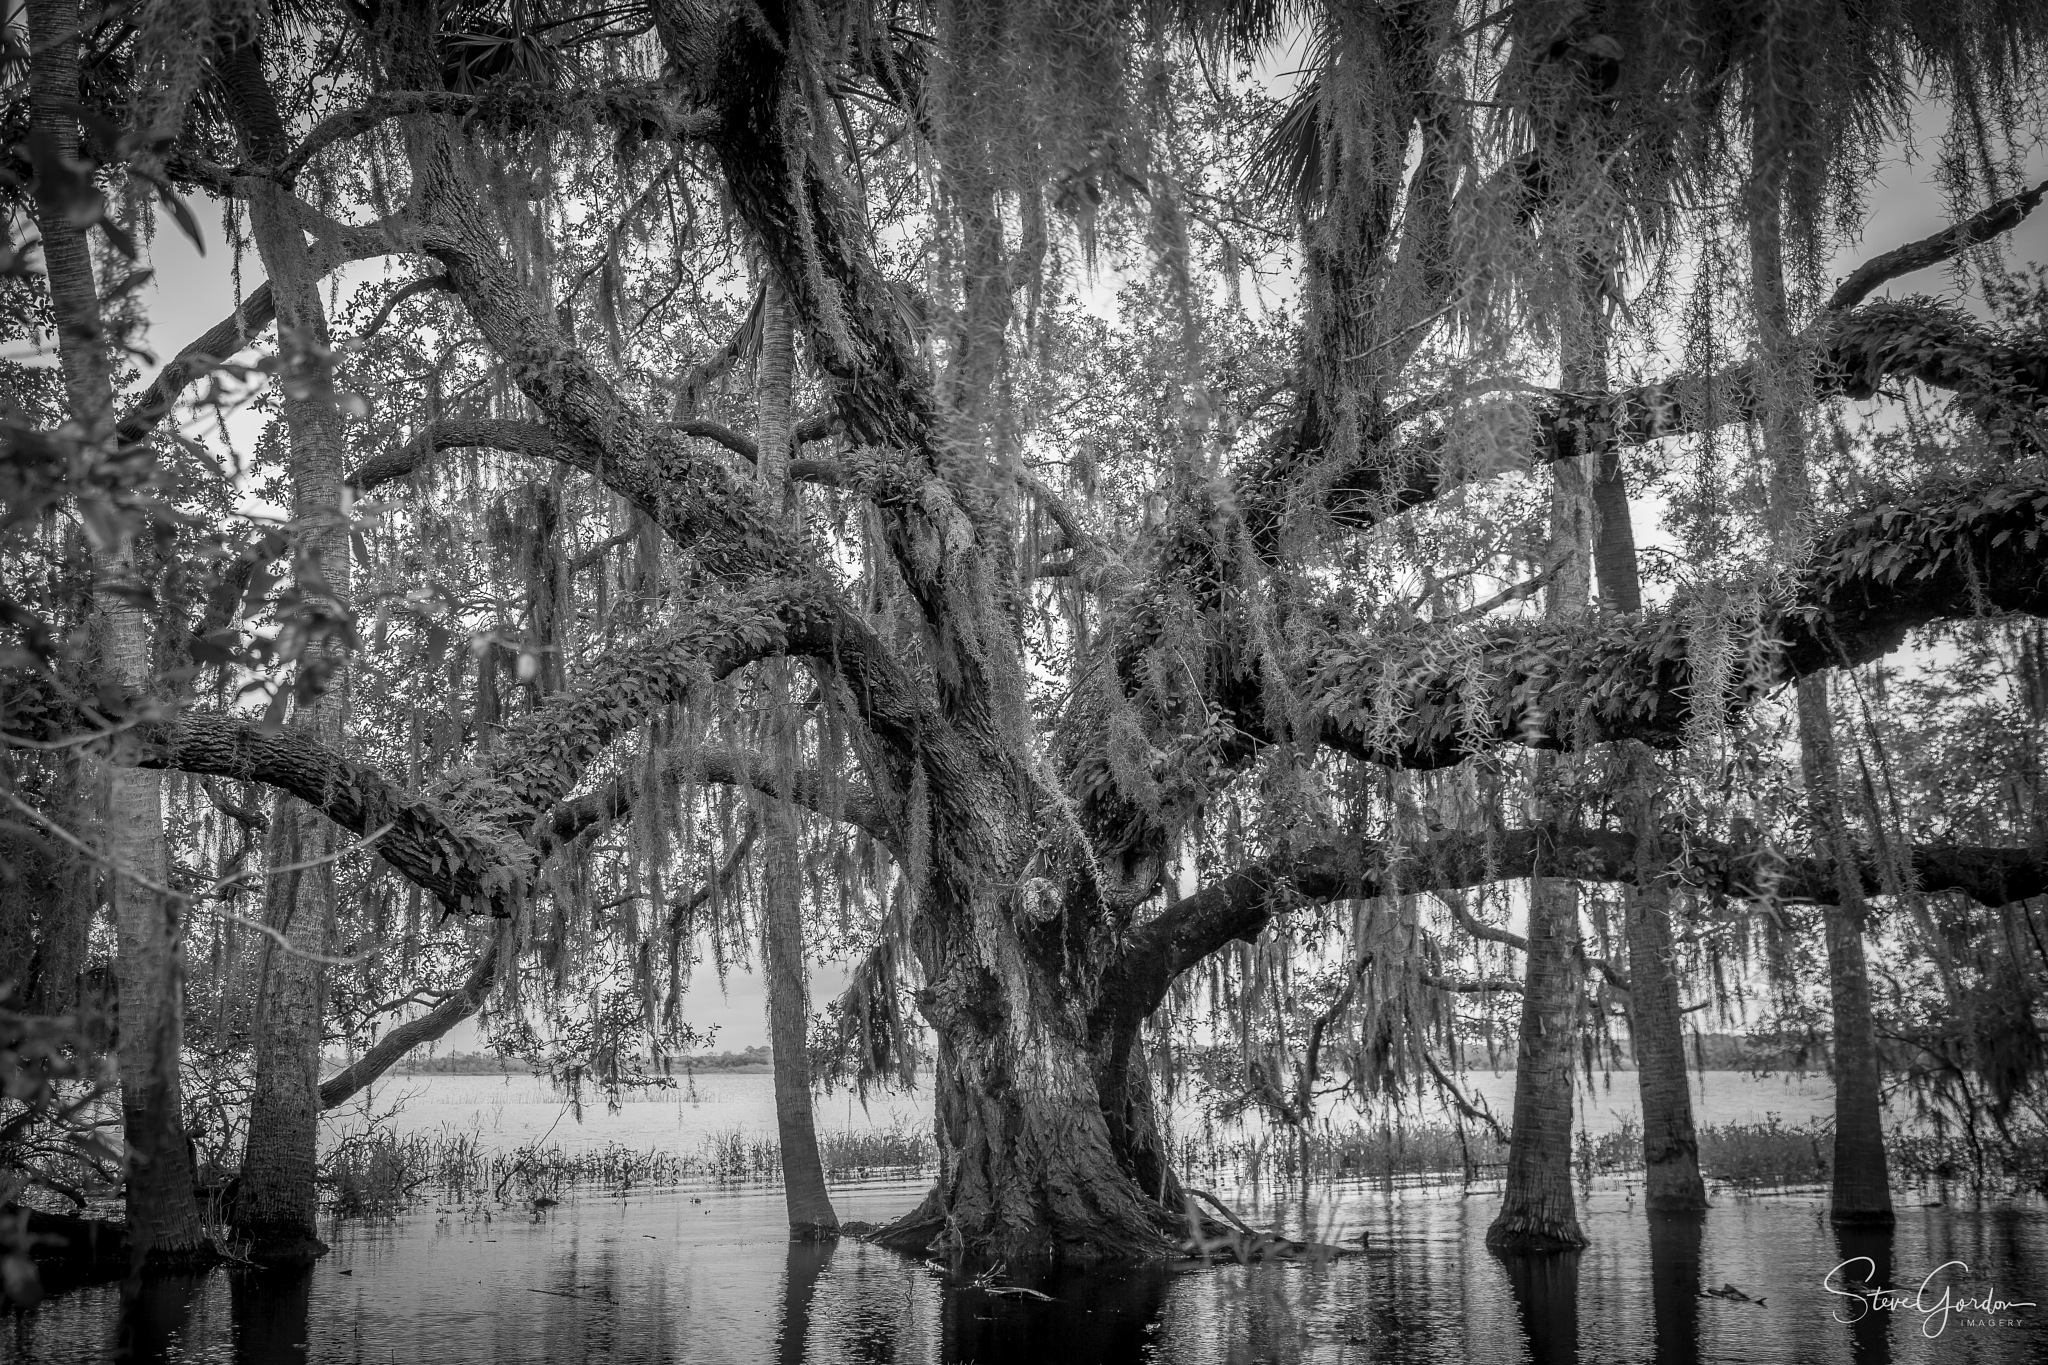 Old sentry of the Lake by Steve Gordon